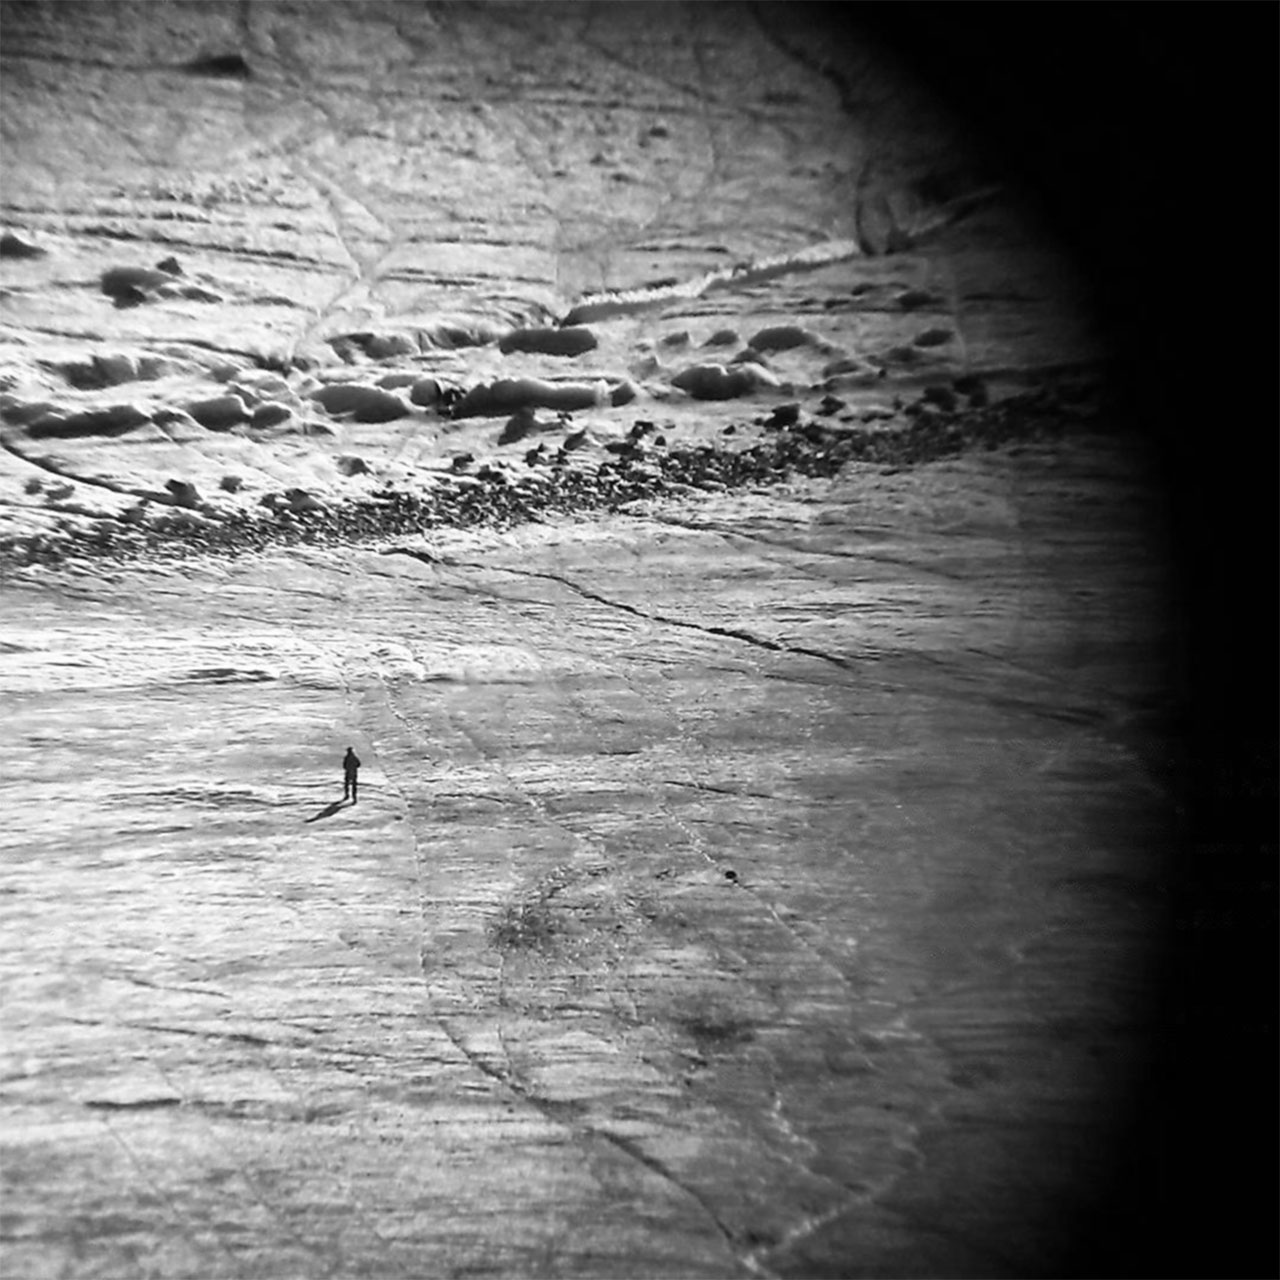 Matt Hulse - Sniper - Felix Schoeller Photoaward